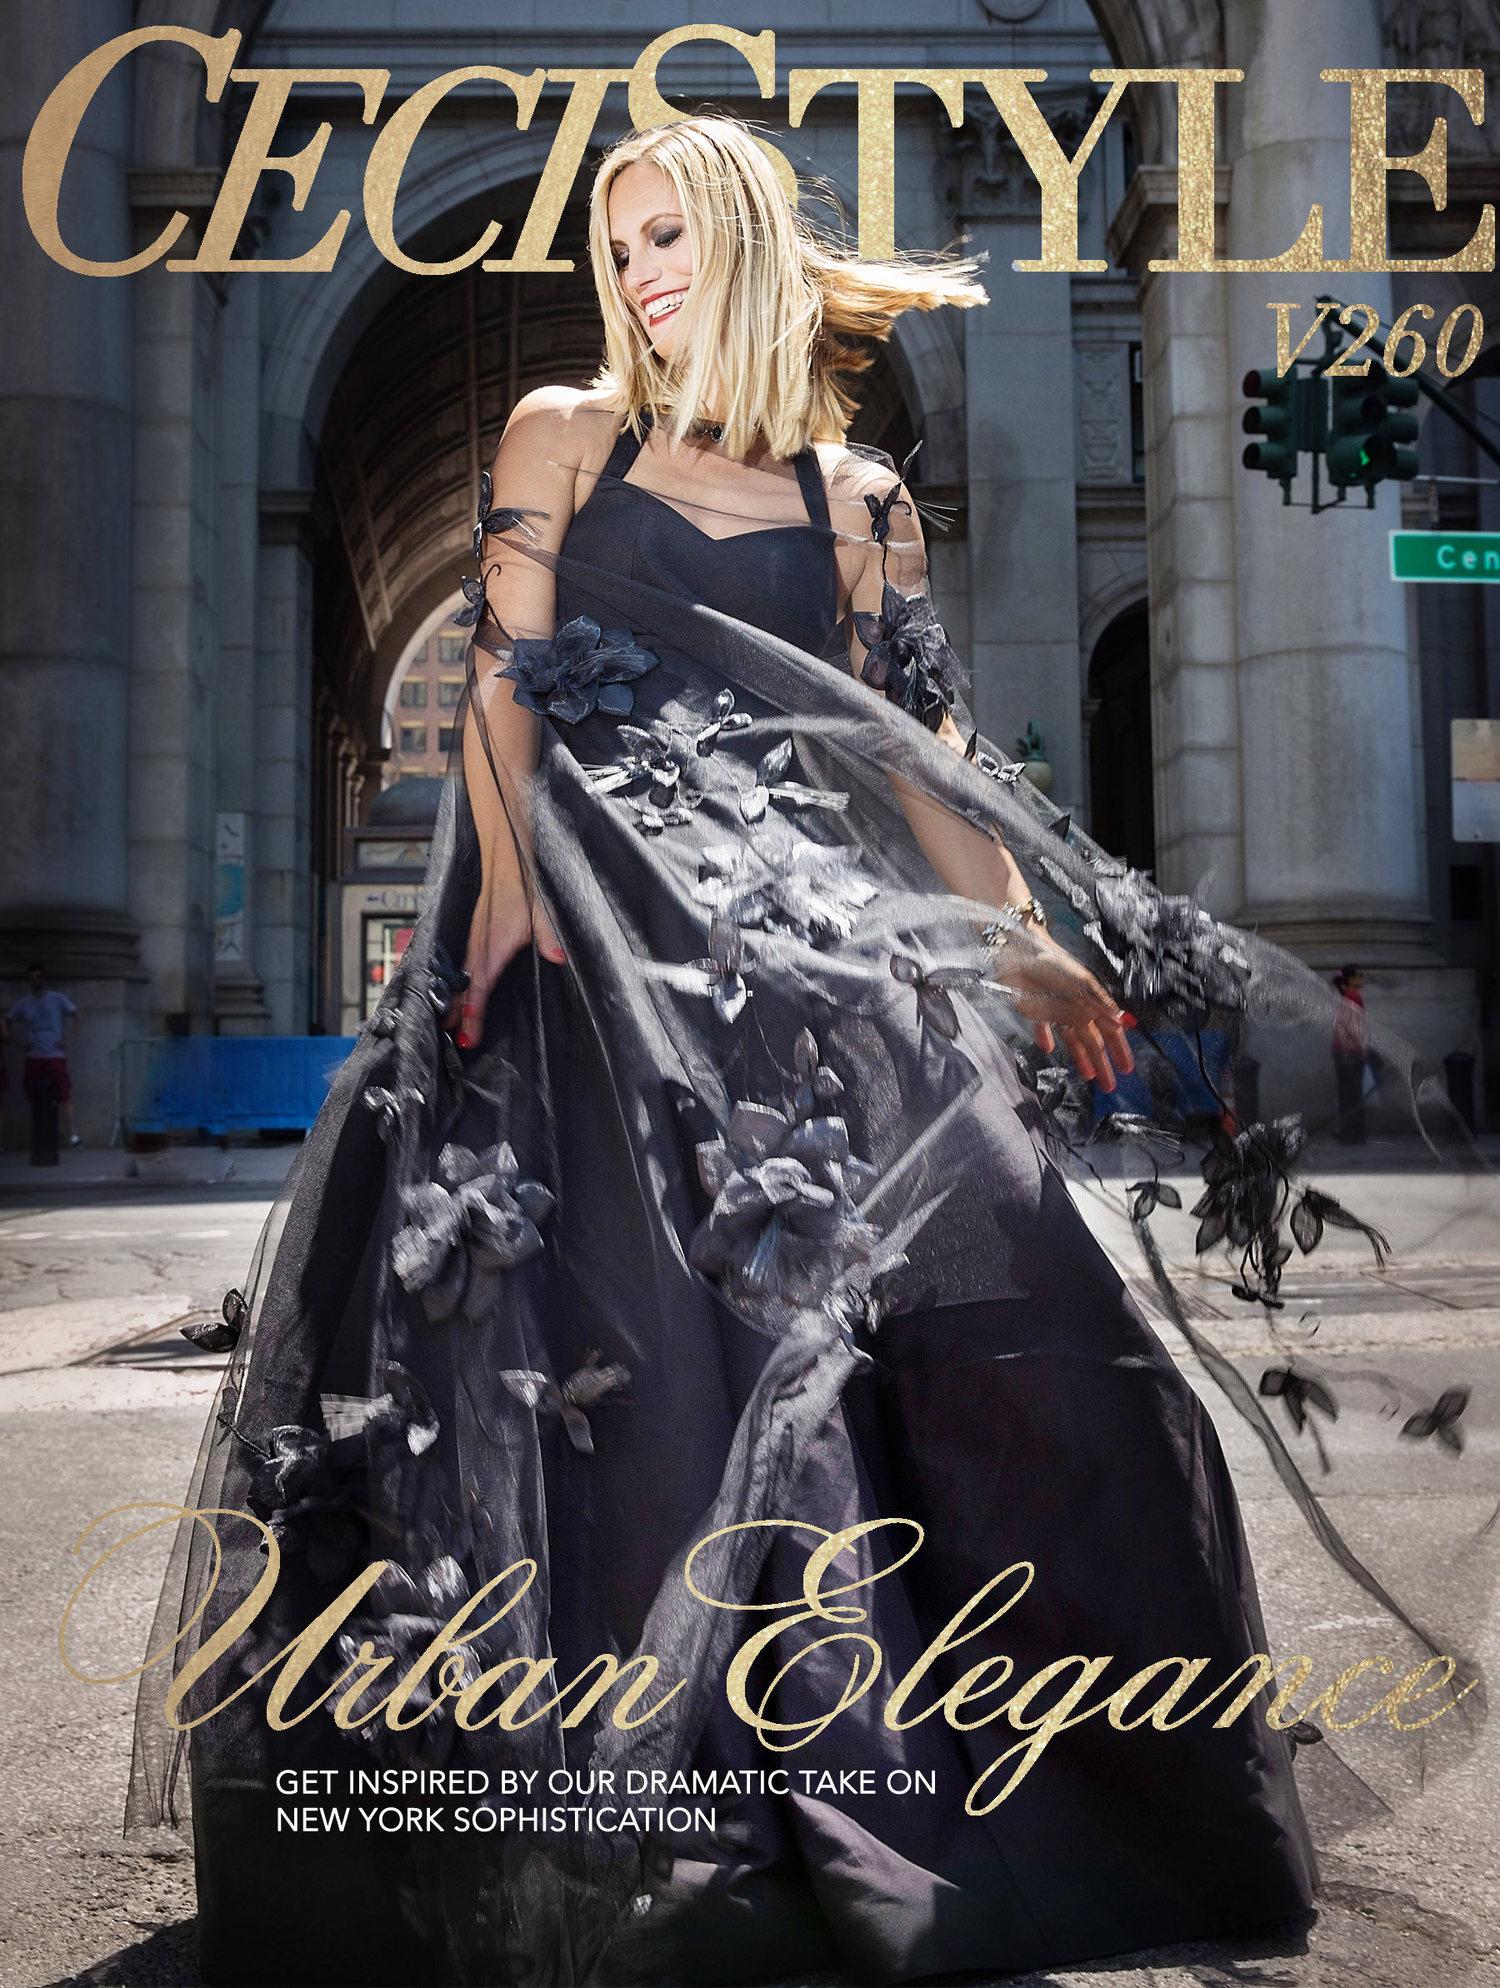 cecistyle_magazine_cover_ceci_johnson_v260_lg.jpg